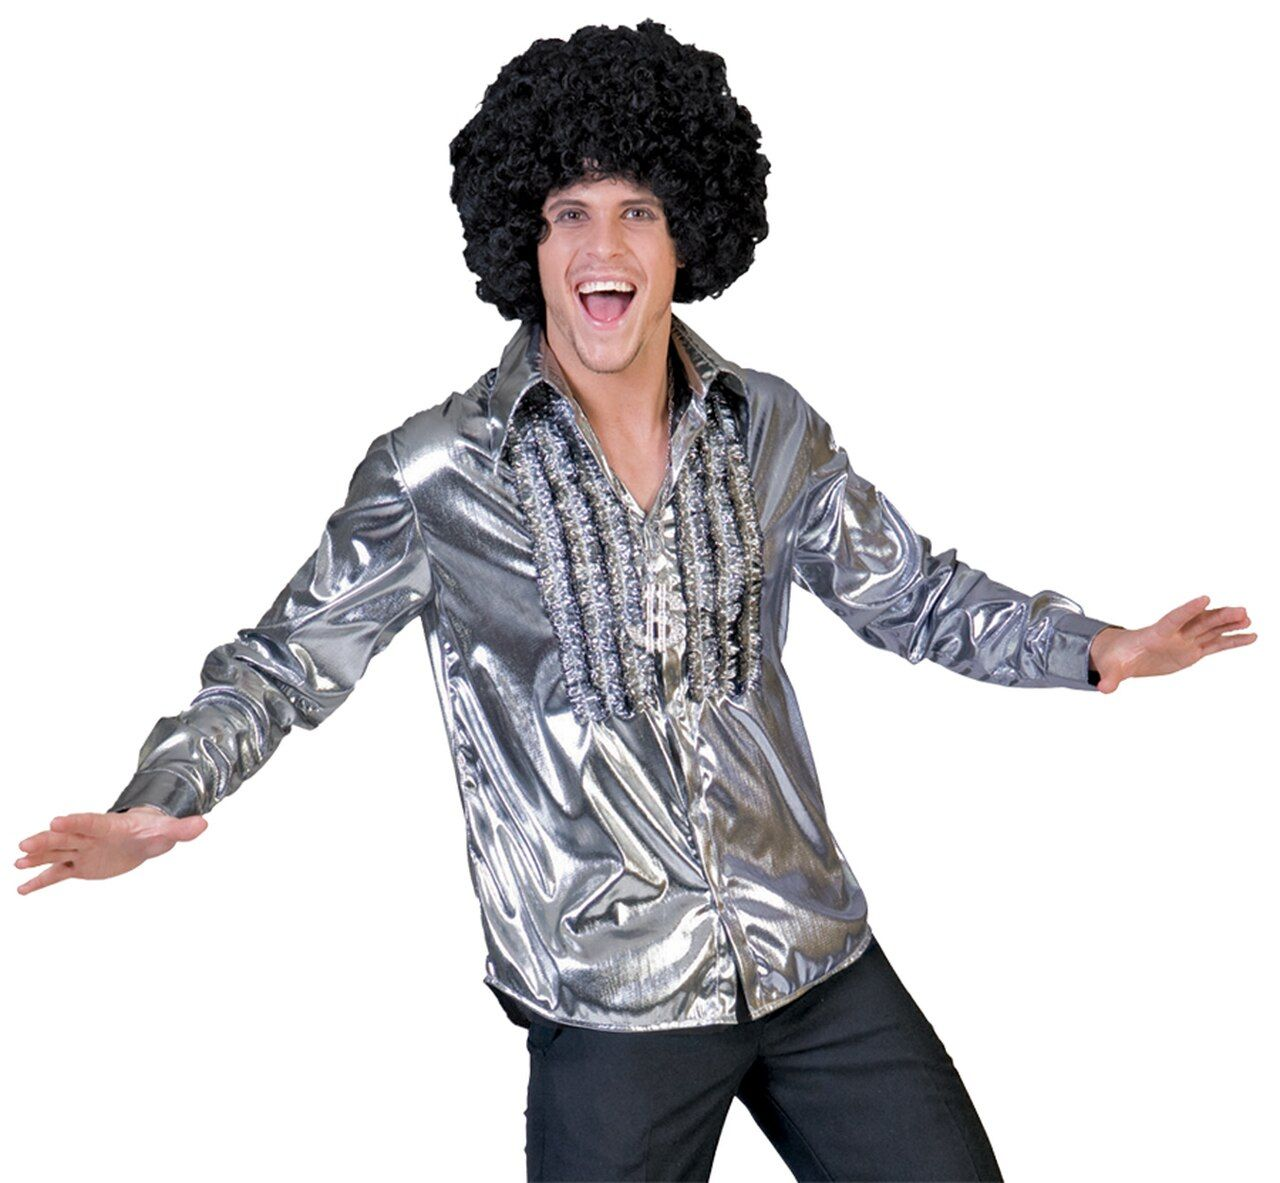 Disco Ruffle Shirt 1970s Mens Fancy Dress Saturday Night Fever 70s Adult Costume